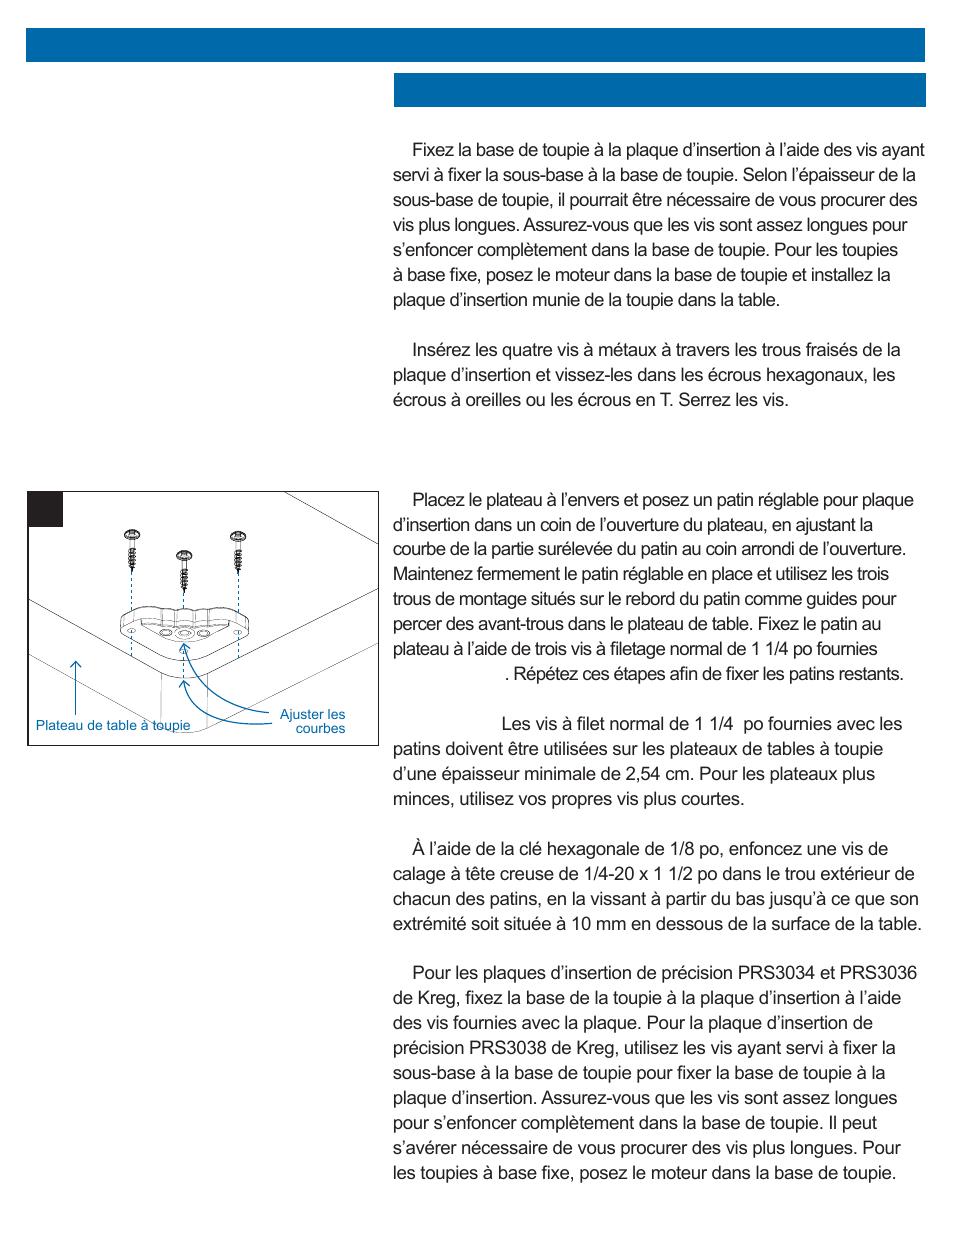 Installation de la plaque dinsertion de prcision kreg prs3038 installation de la plaque dinsertion de prcision kreg prs3038 precision router table insert greentooth Images